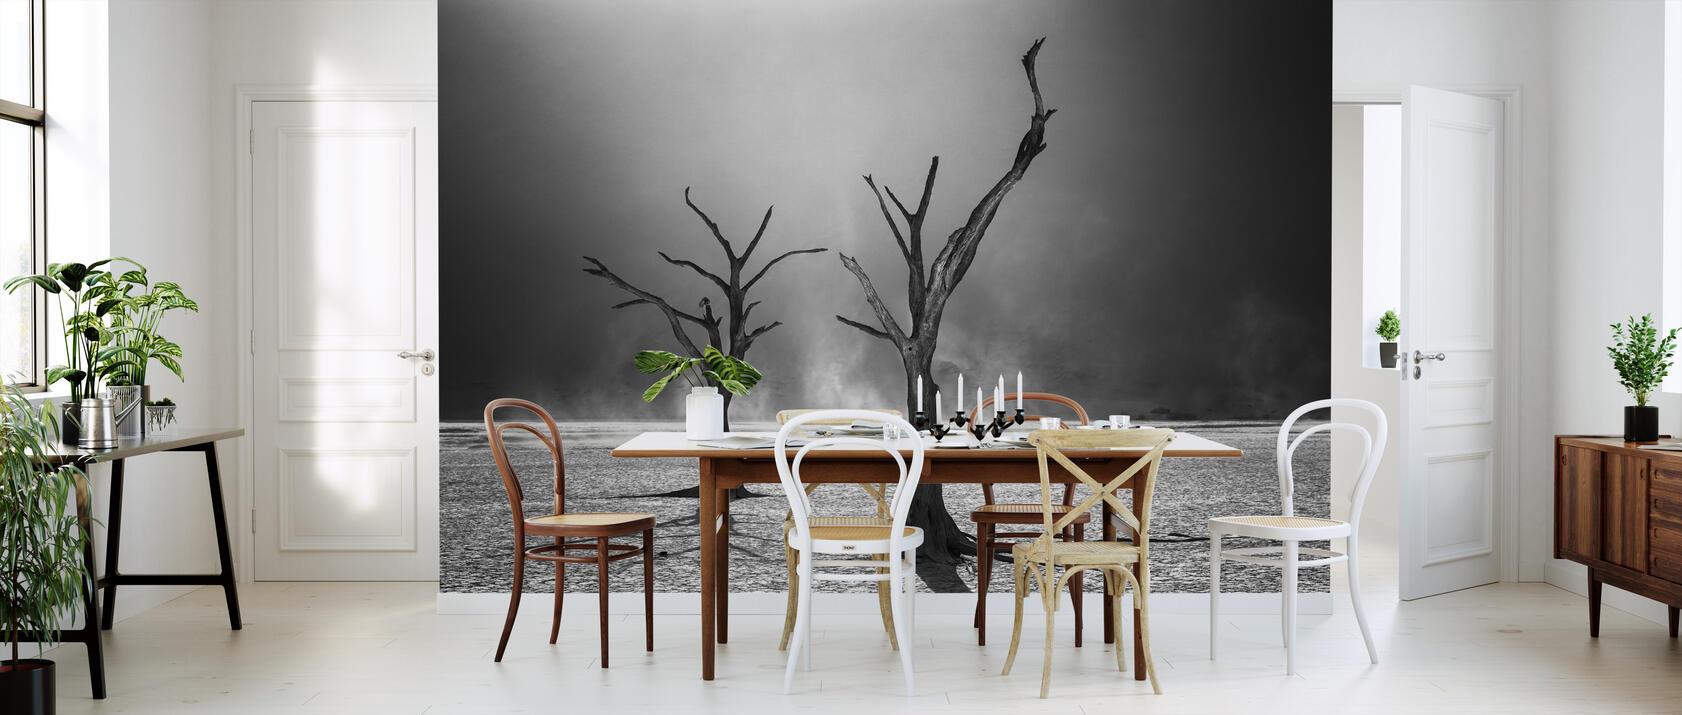 afterlife preiswerte fototapete photowall. Black Bedroom Furniture Sets. Home Design Ideas